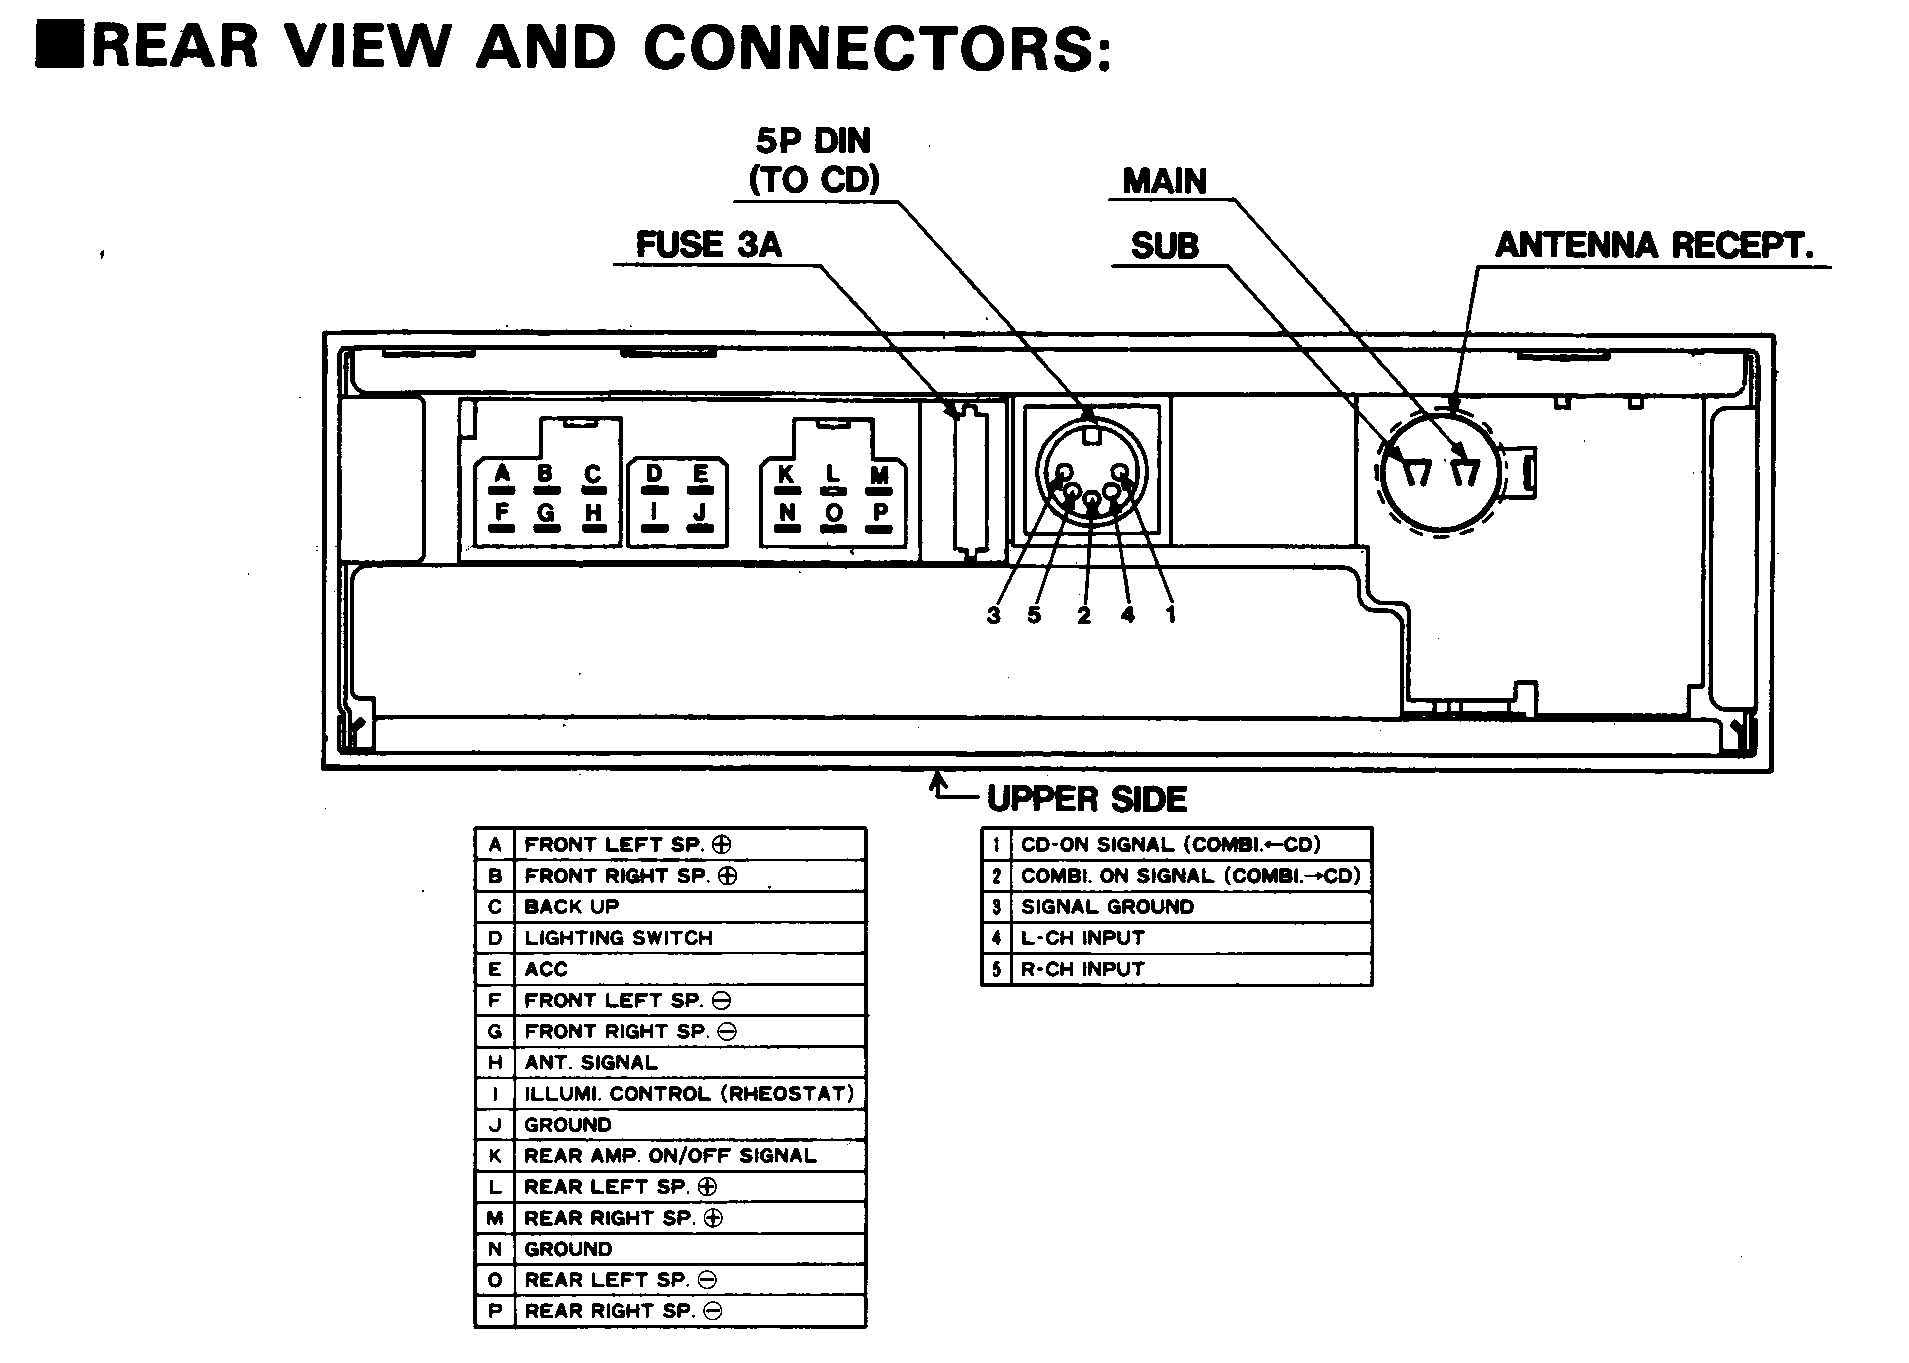 Nissan Hardbody Radio Wiring Diagram 1996 Chevy Wiring Diagrams Coded 03 Losdol Jeanjaures37 Fr